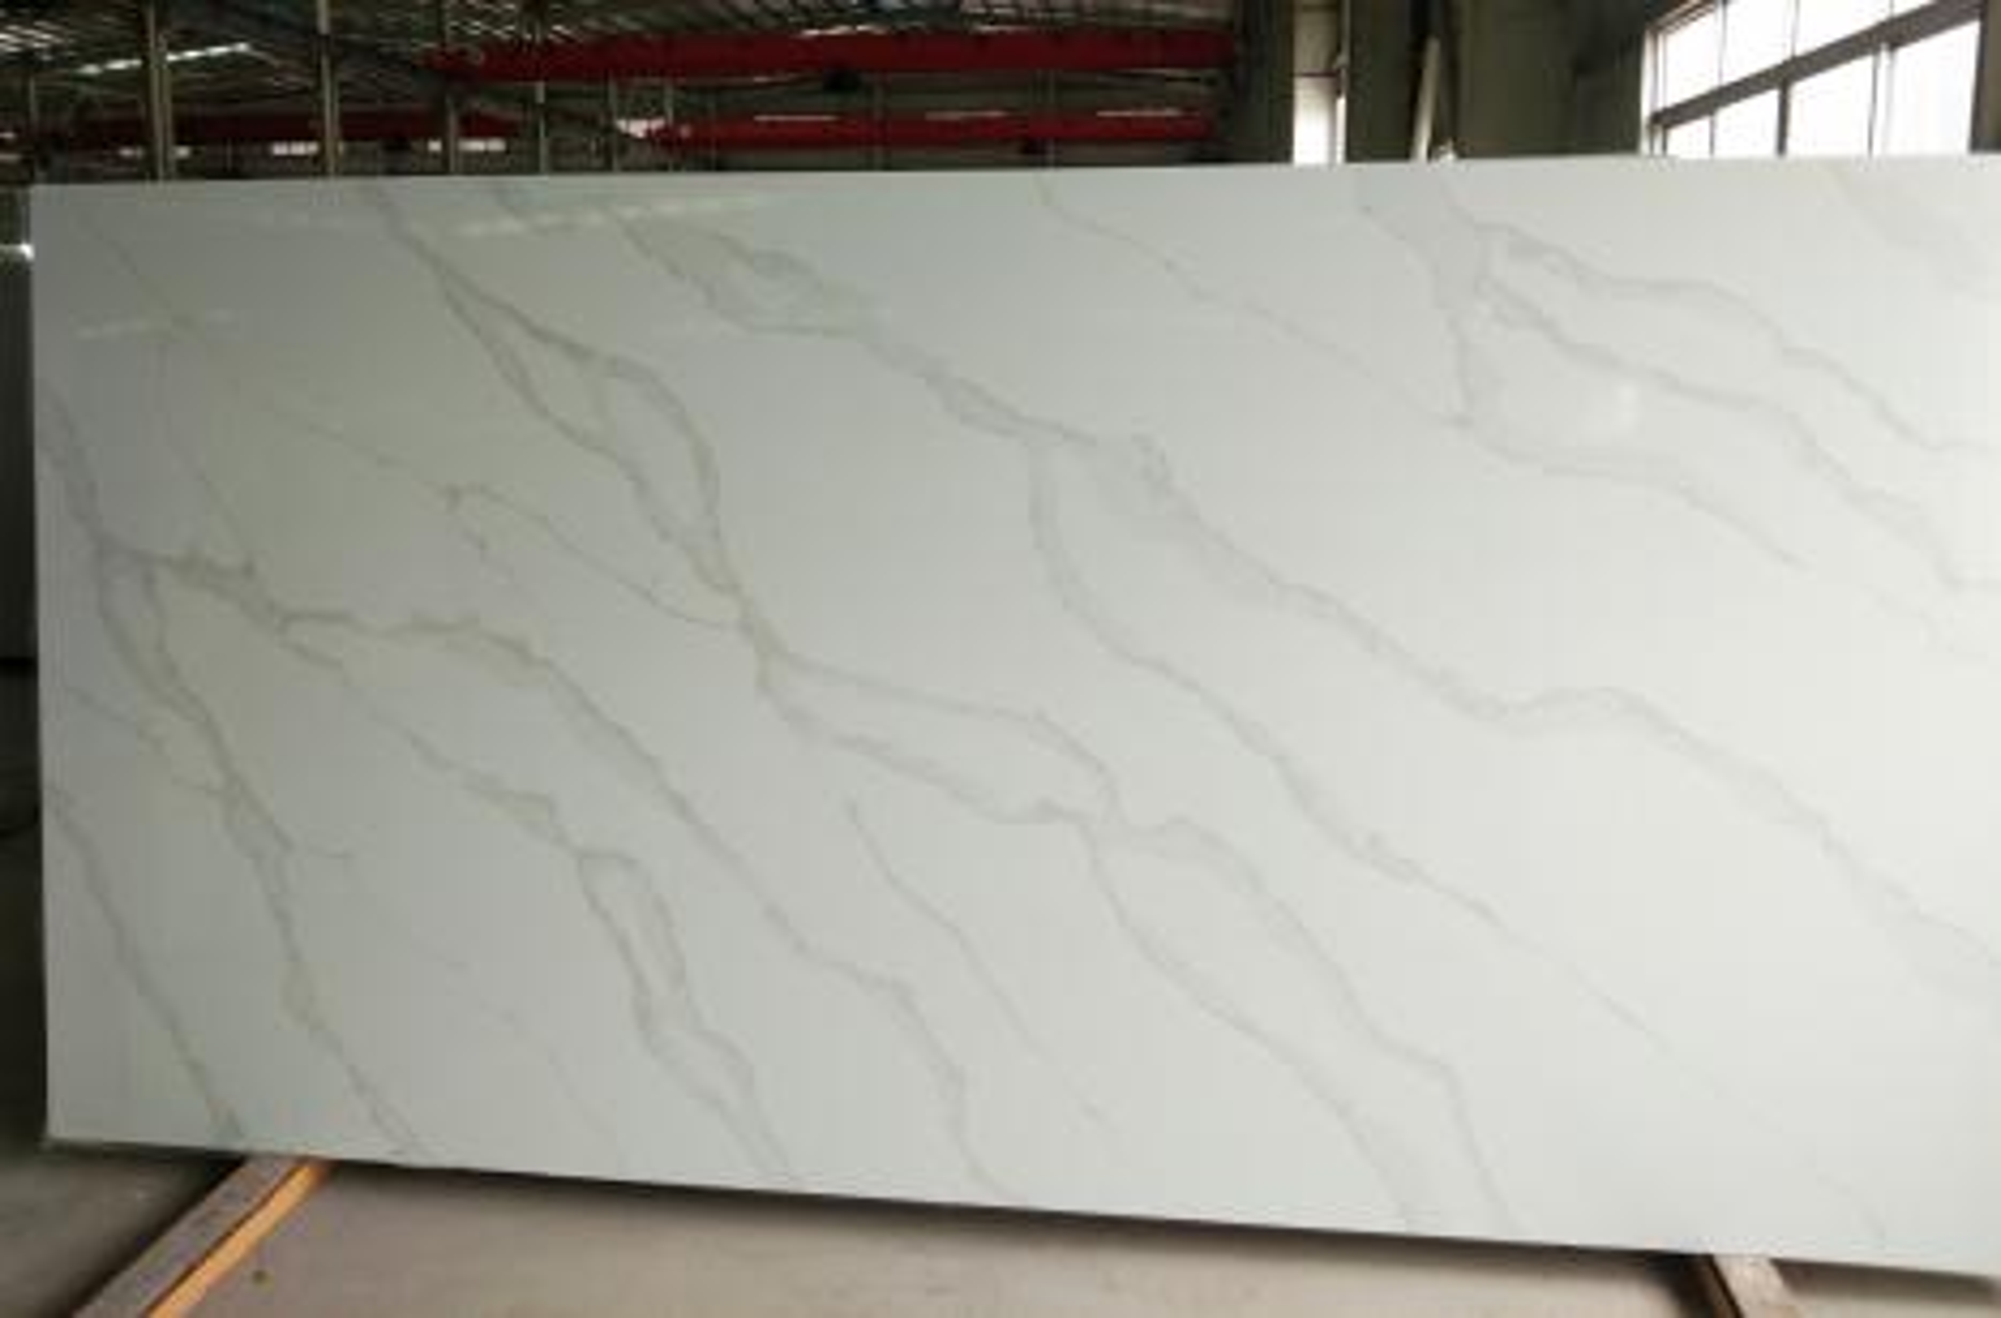 TIRRENO Supply Hai Phong (Vietnam) polished slabs AB 9331 , SL3CM artificial aglo quartz